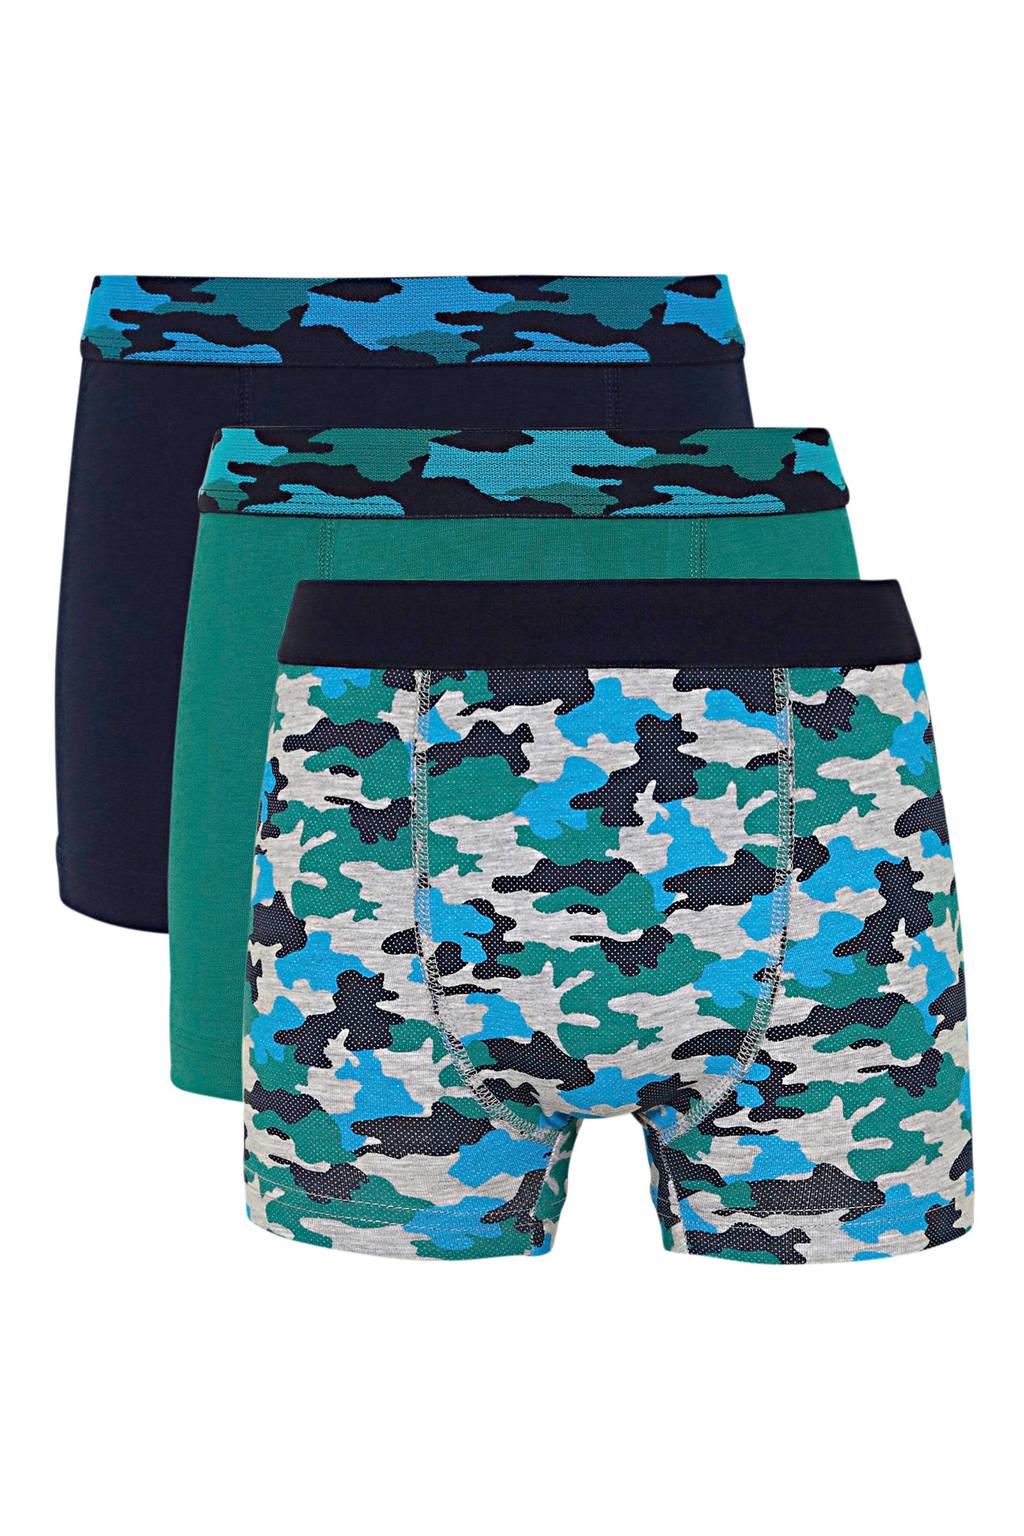 C&A Here & There   boxershort - set van 3 donkerblauw/groen, Donkerblauw/groen